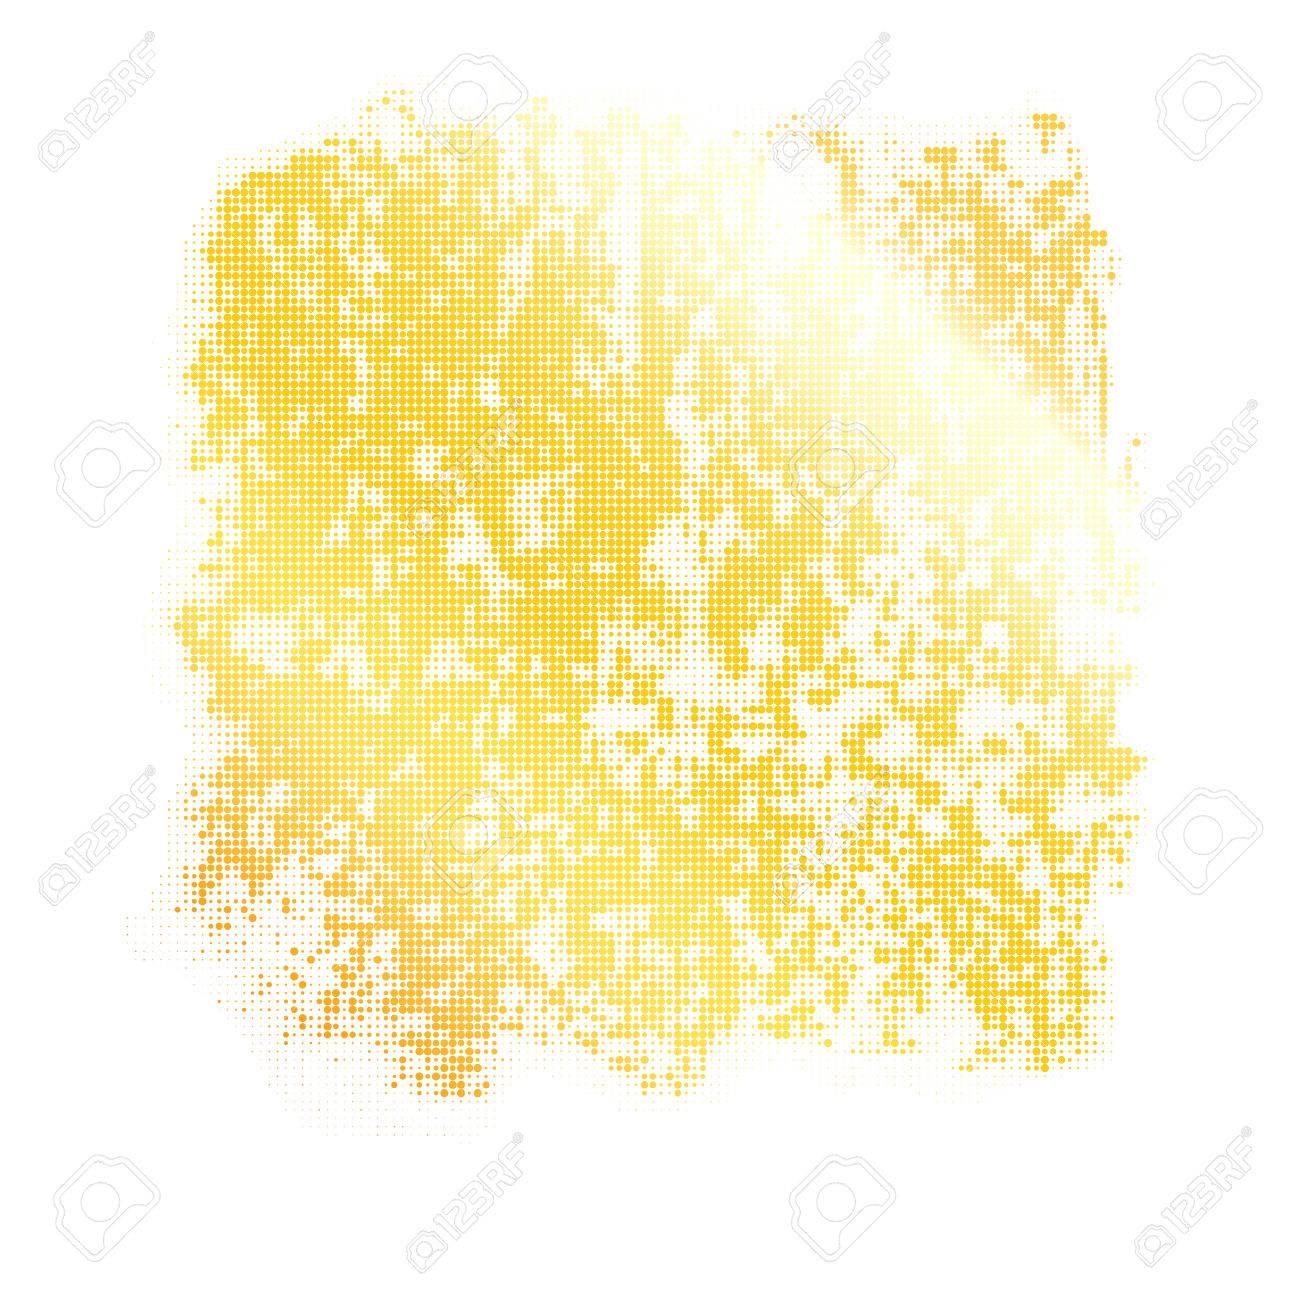 938014280092 Gold background vector image. Vector metal texture. Solid gold texture.  Vector metal background